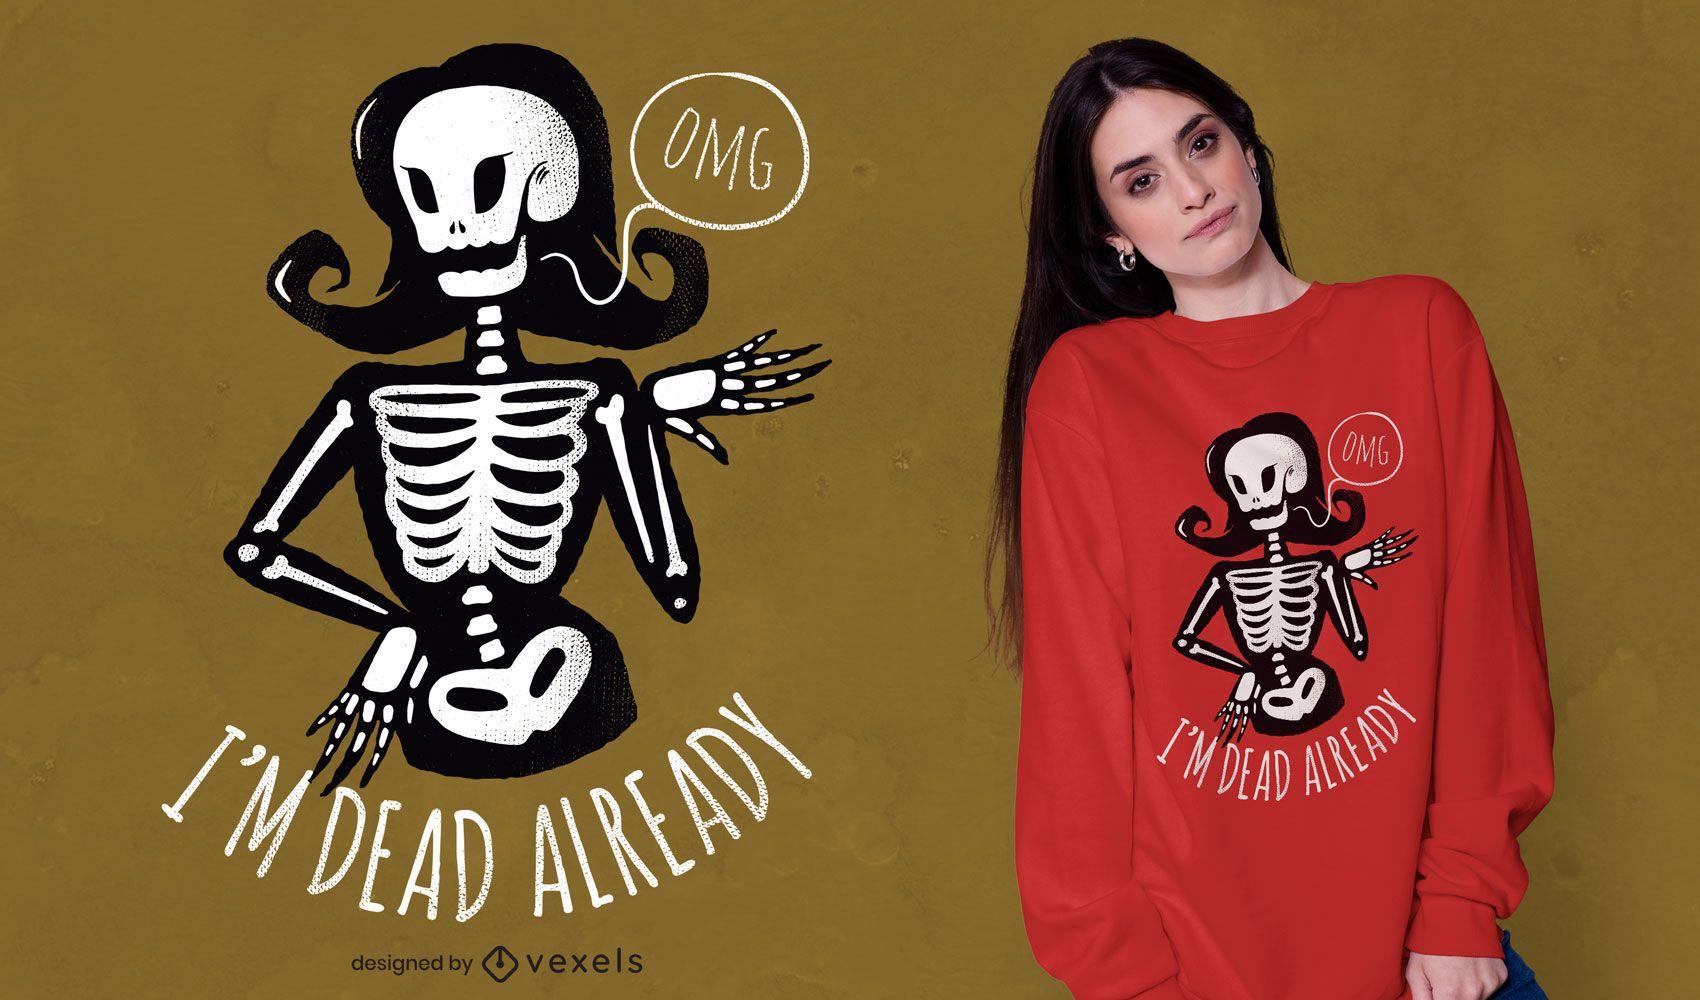 I'm dead already t-shirt design